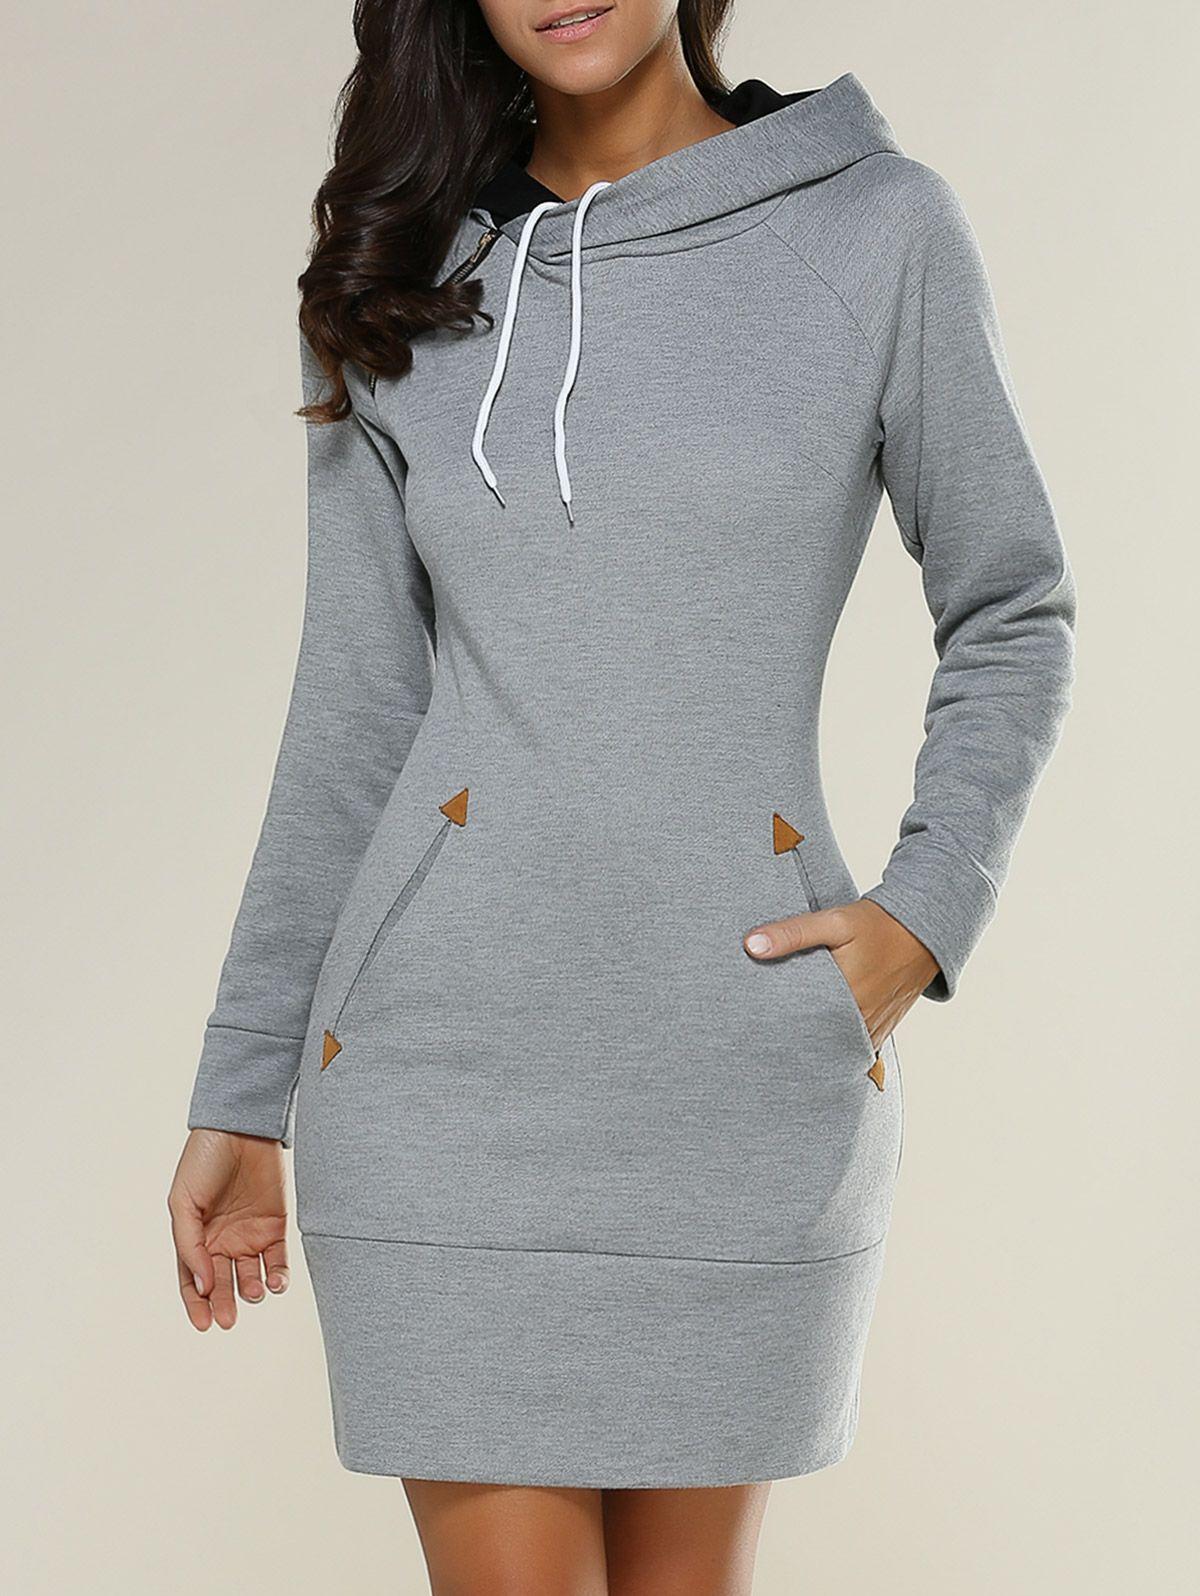 Tight short long sleeve long hoodie mini dress comfy casual minis